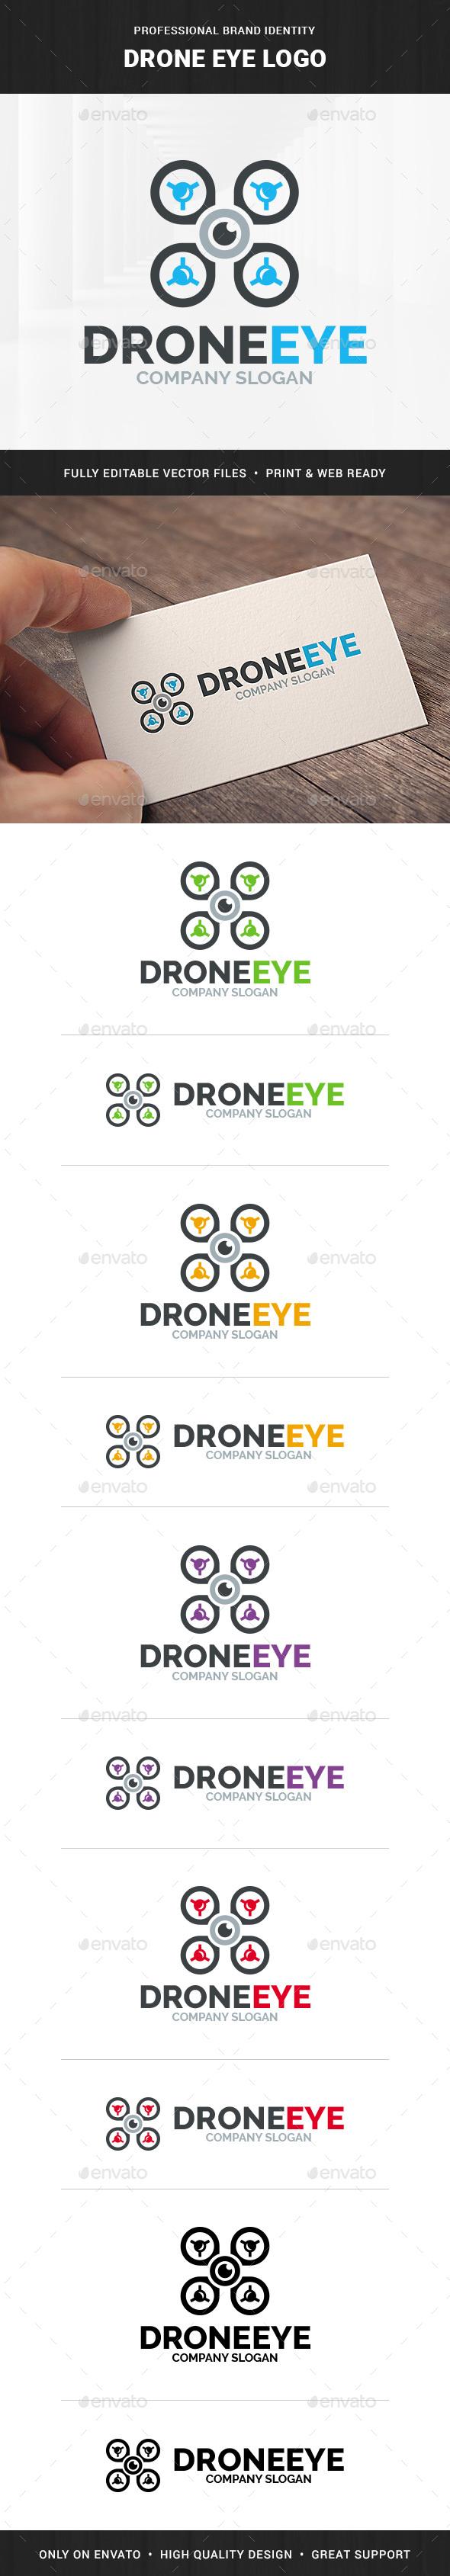 Drone Eye Logo Template